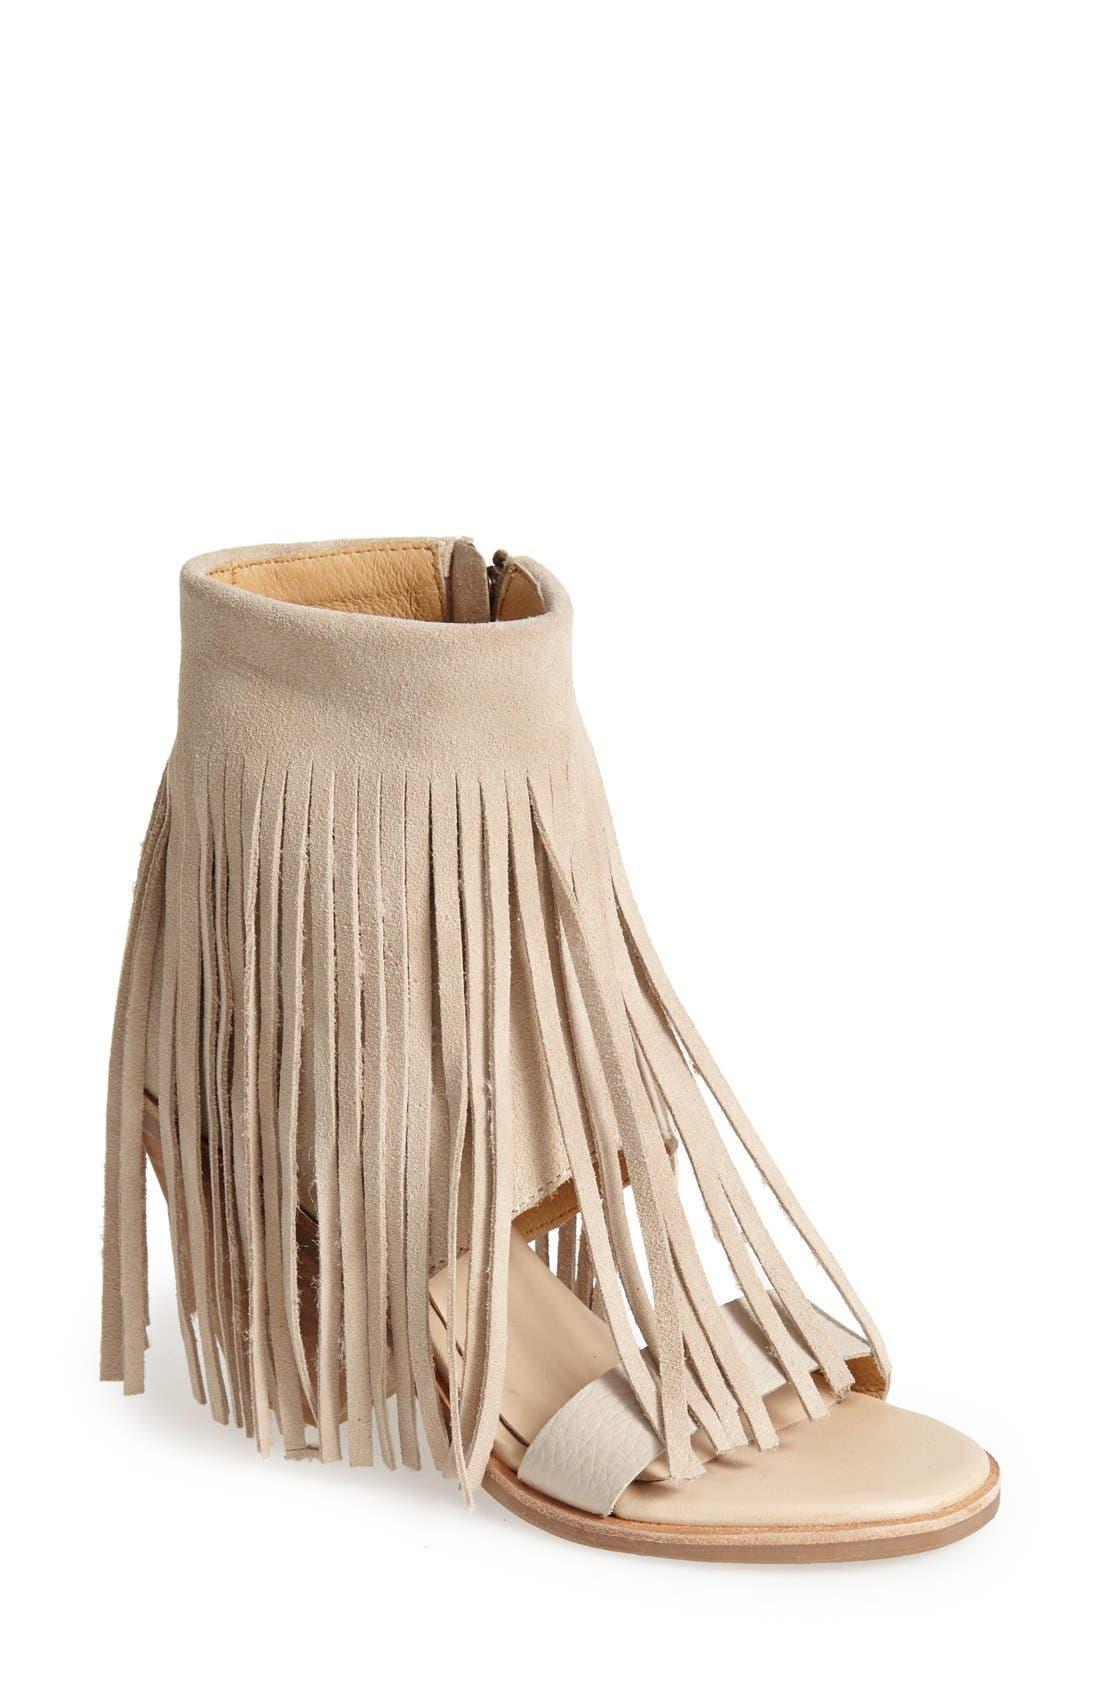 Alternate Image 1 Selected - Koolaburra 'Piaz II' Fringed Boot Cuff Sandal